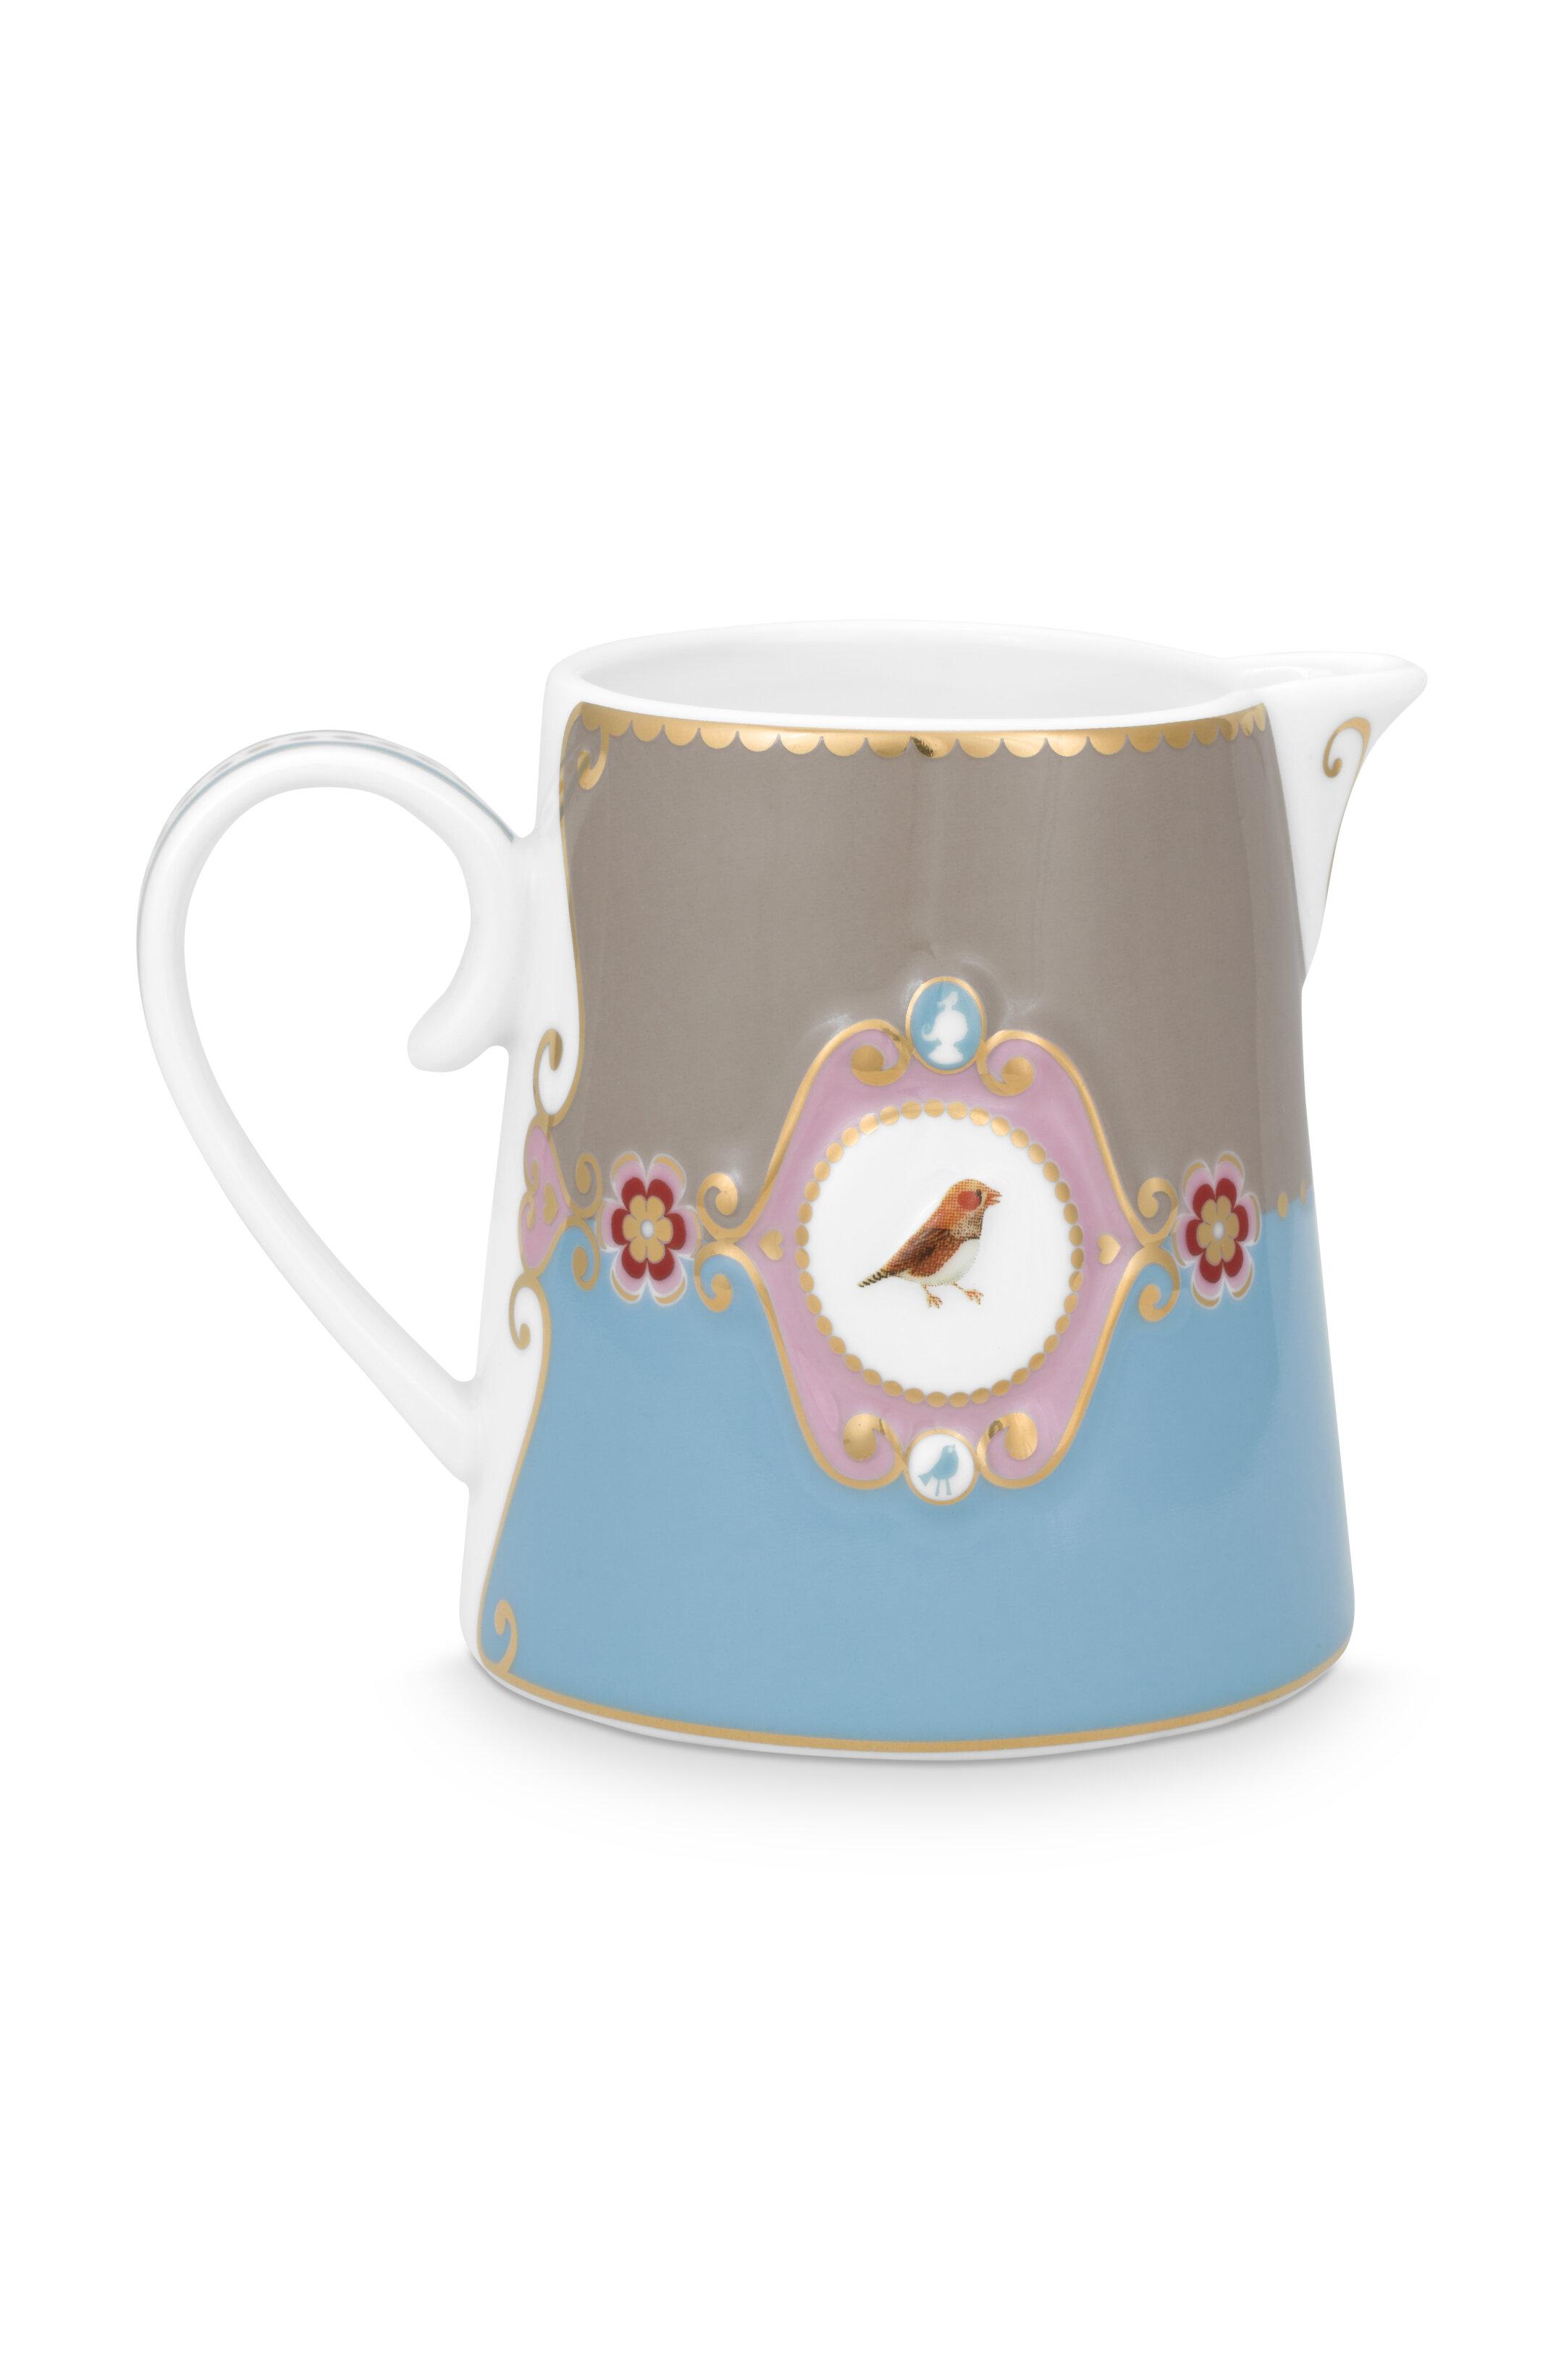 Pip Studio Love Birds Kanne Klein Medaillon Blau-Khaki